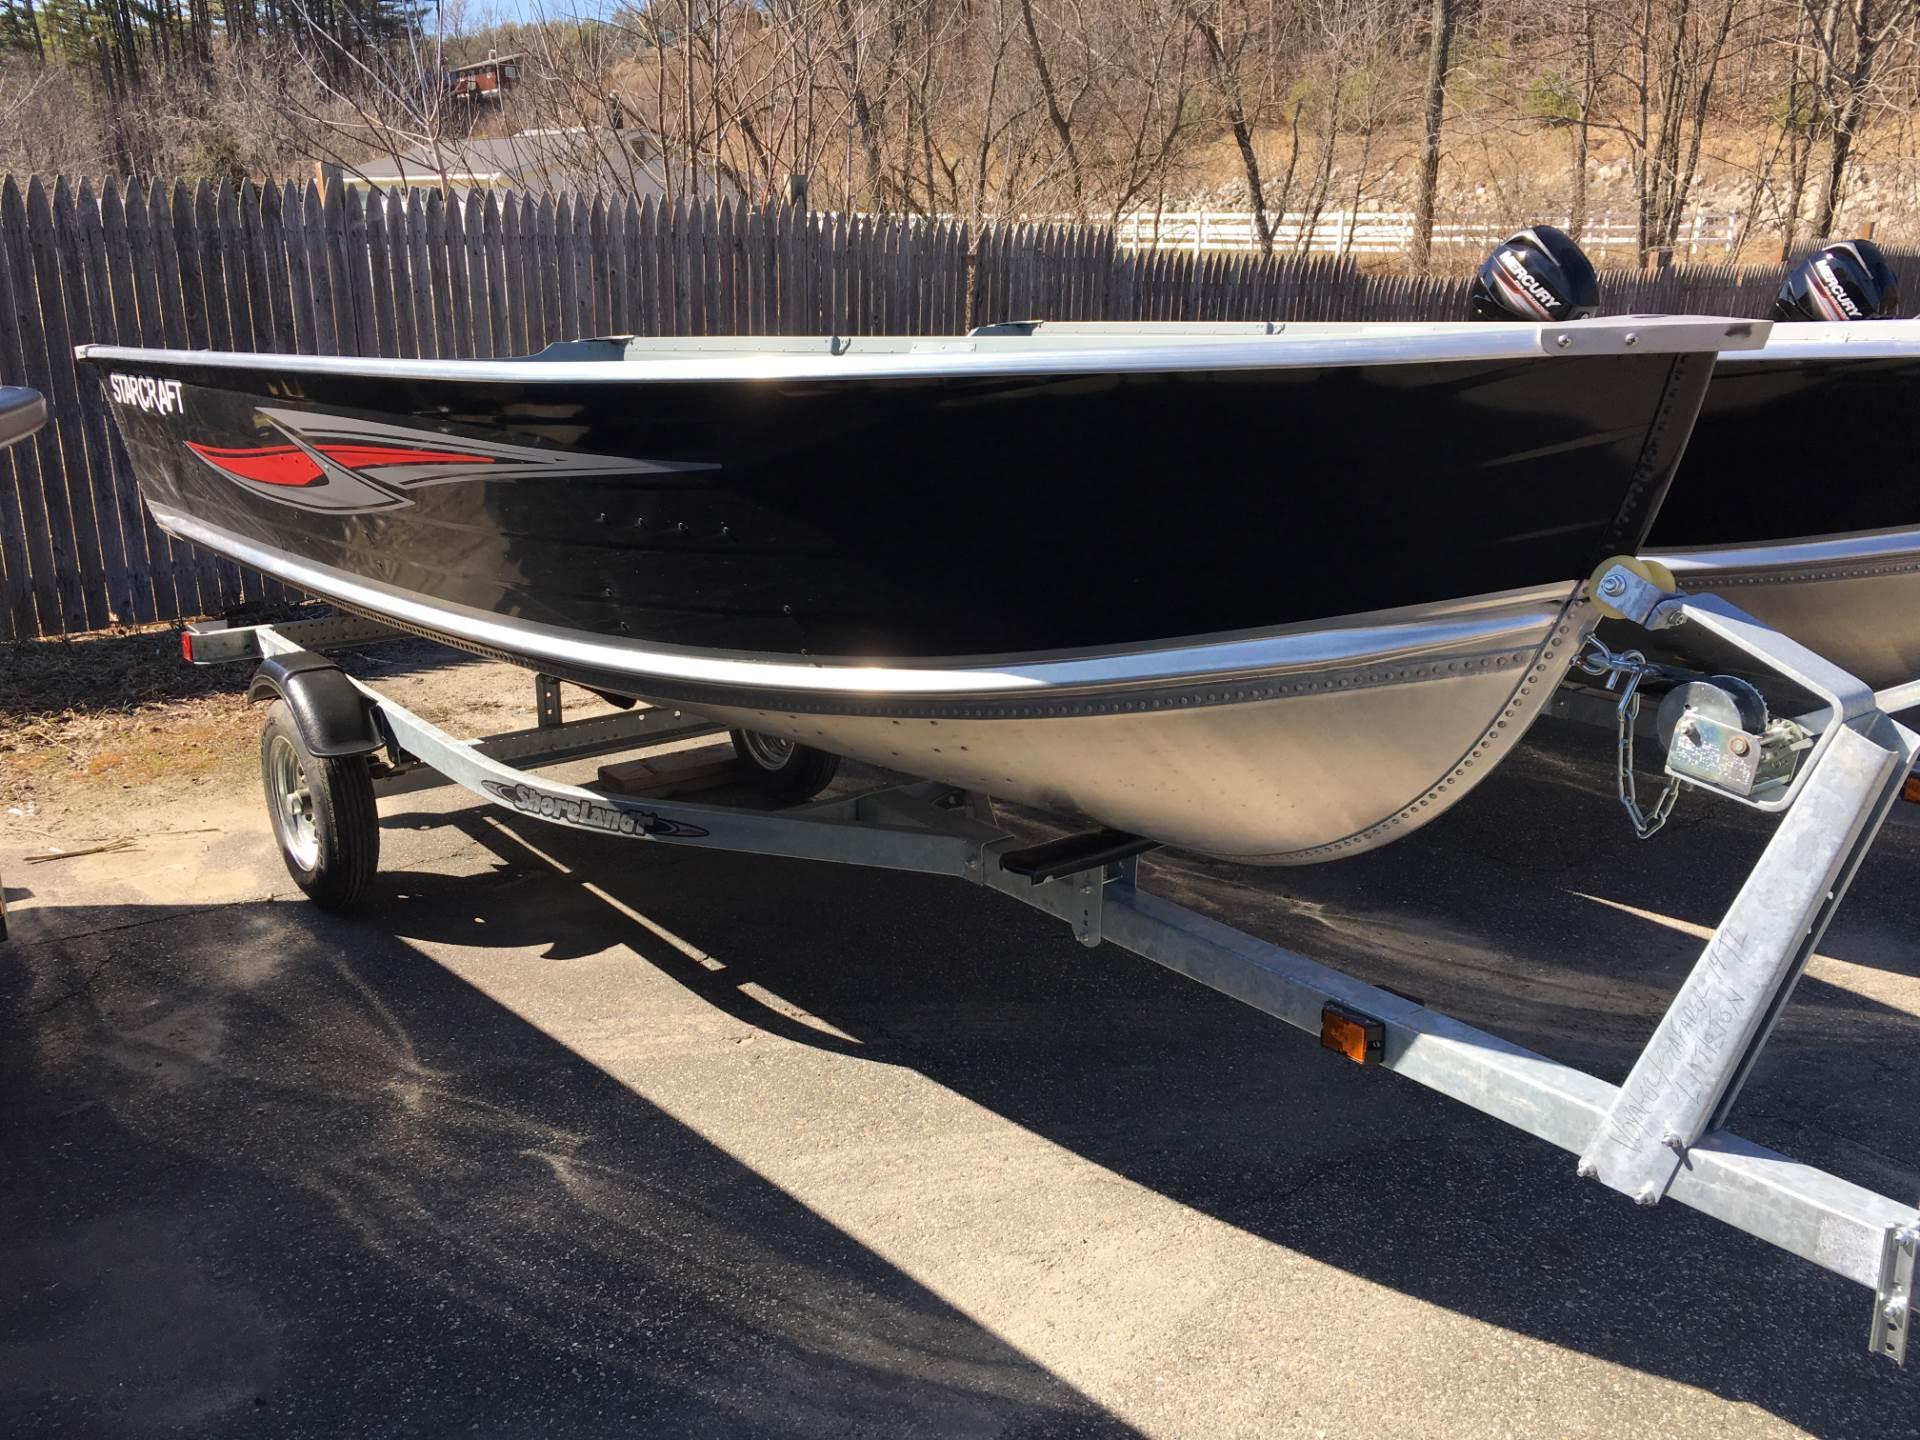 2017 VOYAGER/SEAFARER 14 TL SPLIT SEAT